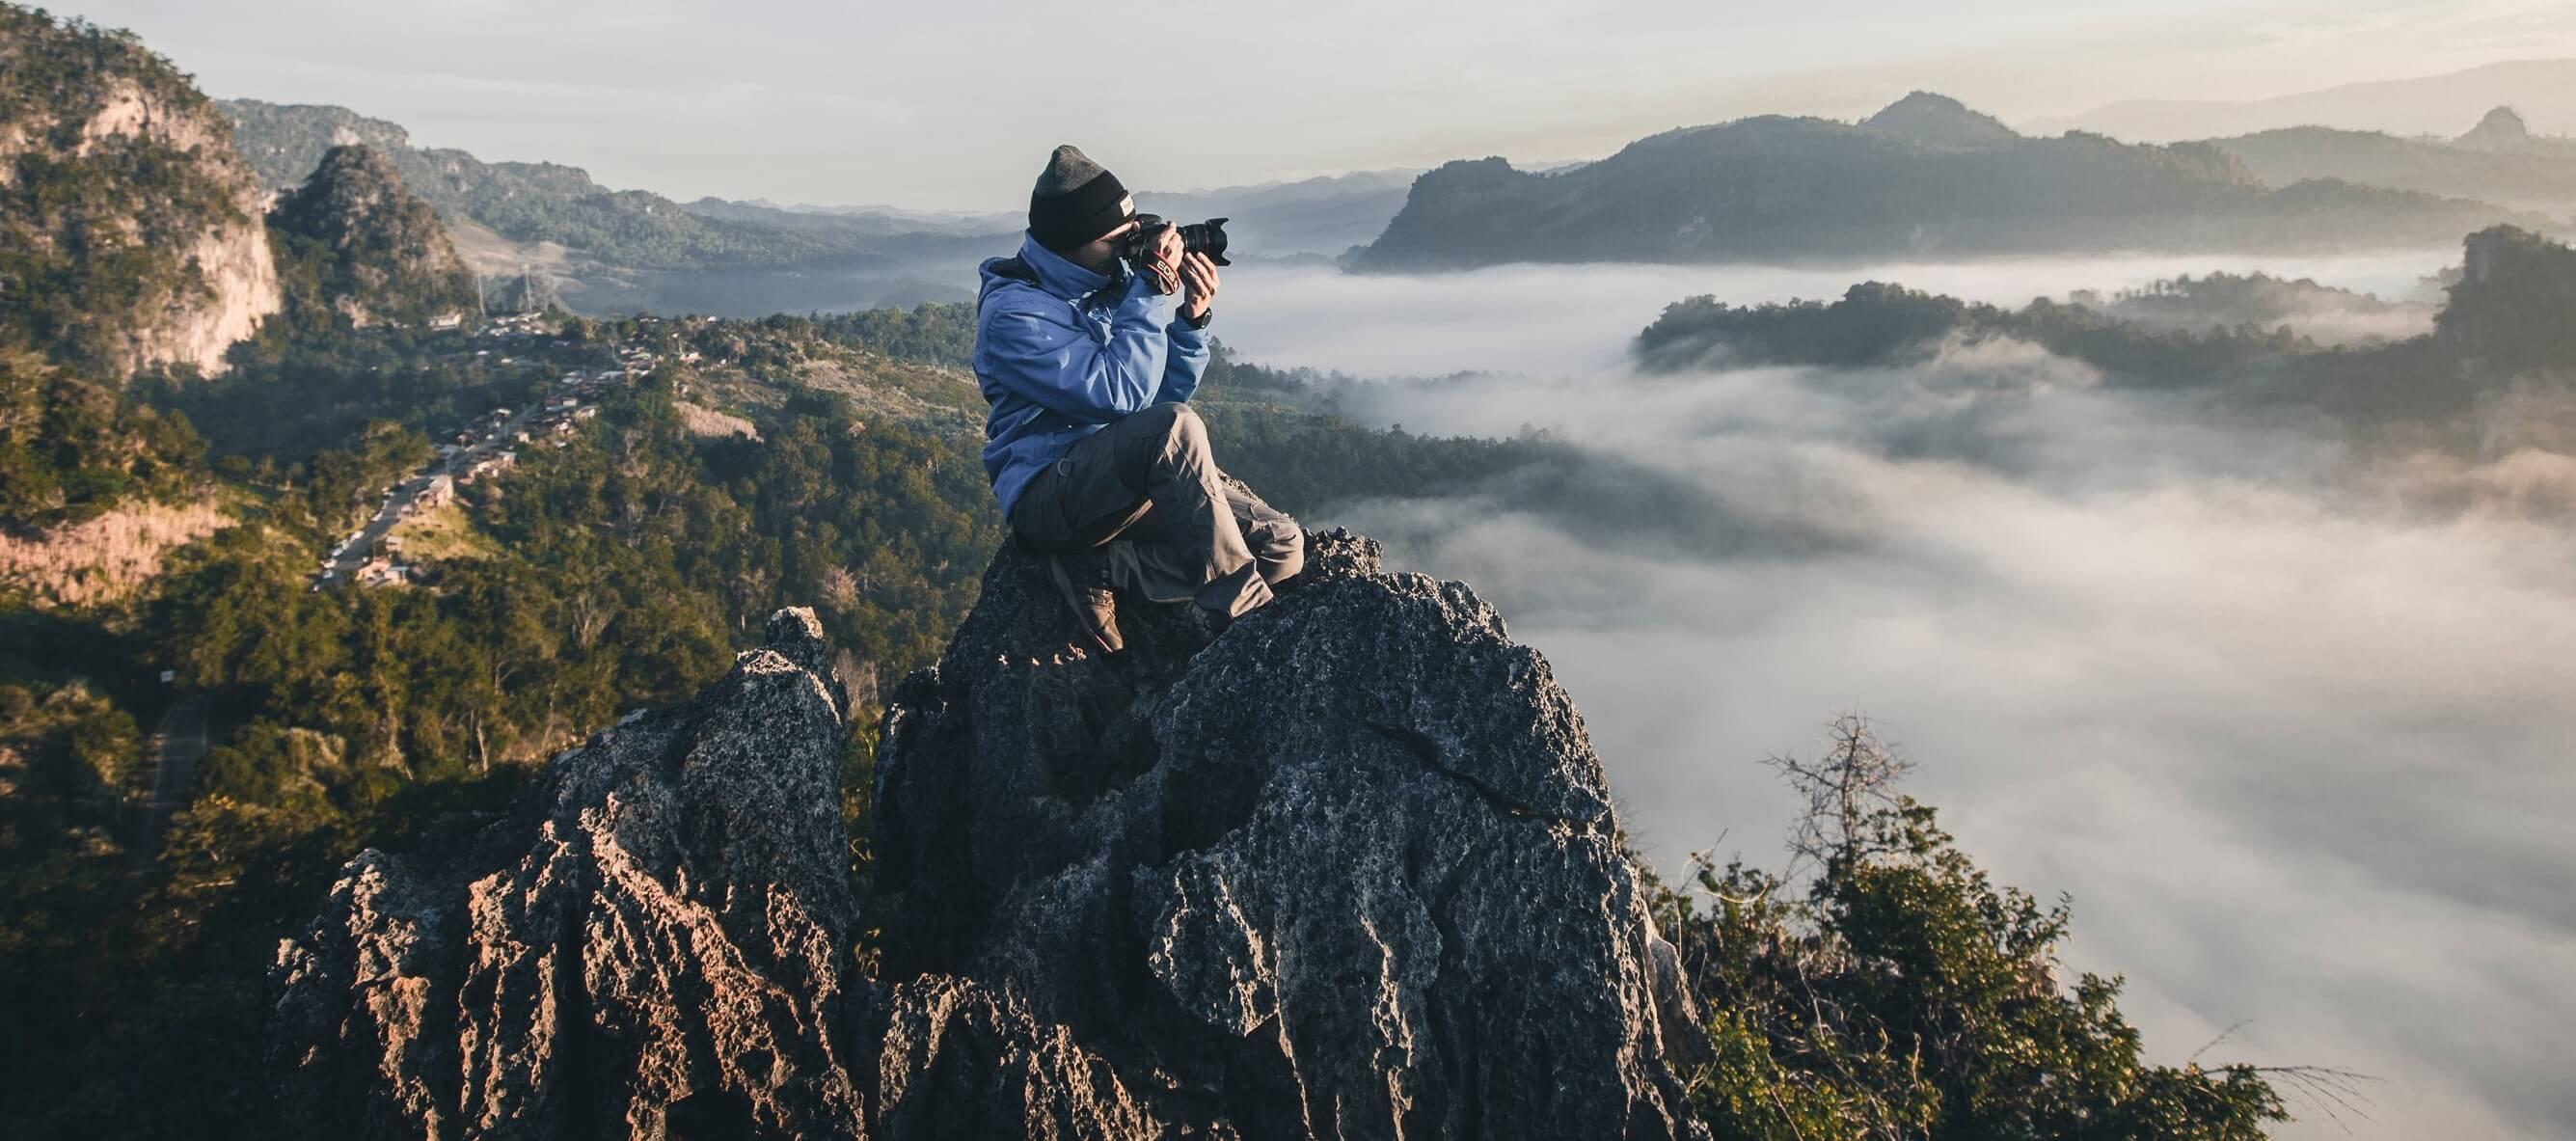 Outdoorfotografie im Fokus - Guide